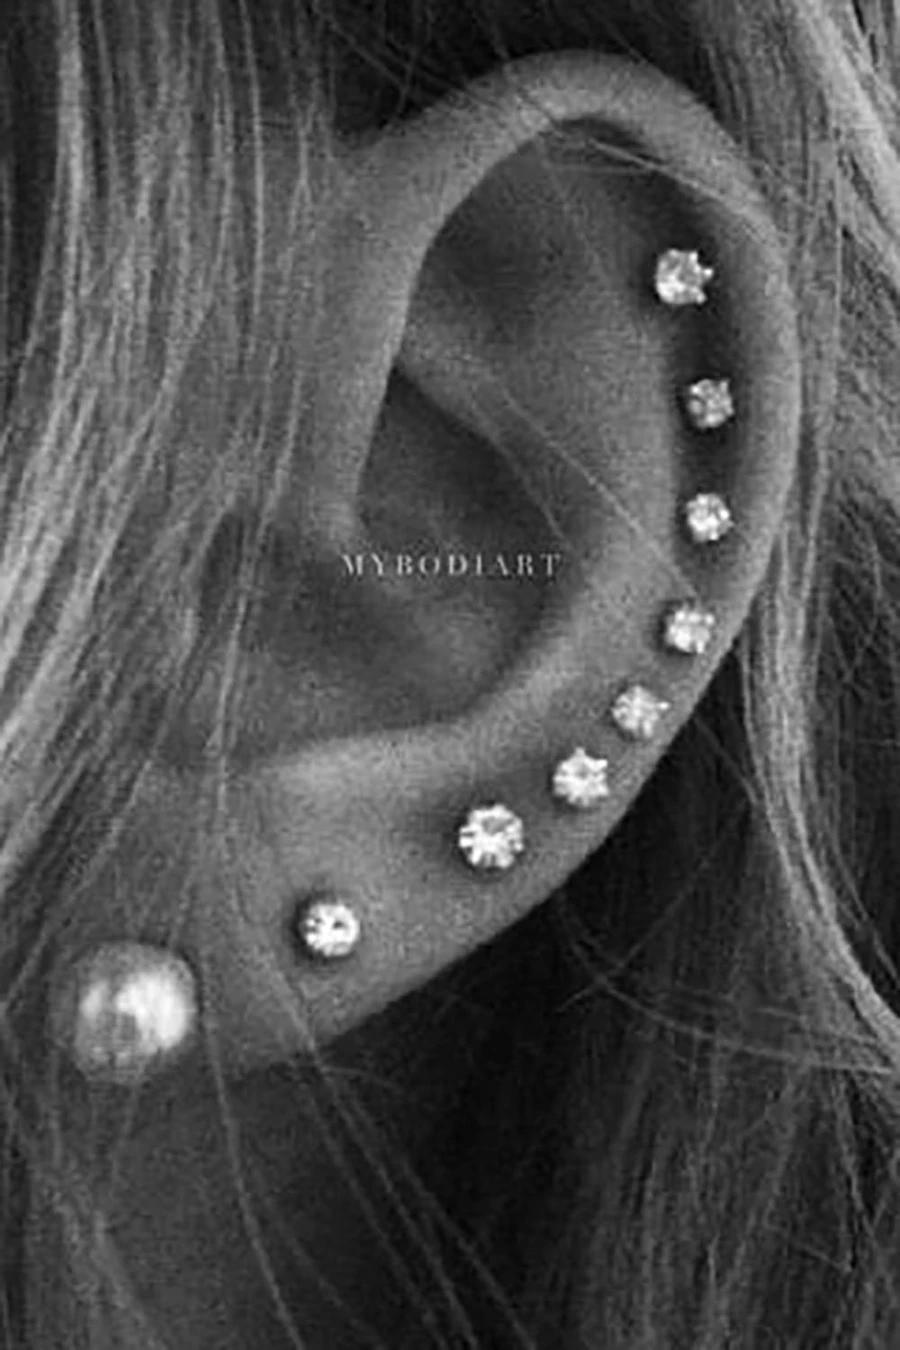 Pretty All The Way Around Cartilage Helix Multiple Ear Piercing Ideas For Women In 2020 Pretty Ear Piercings Full Ear Piercings Cute Ear Piercings